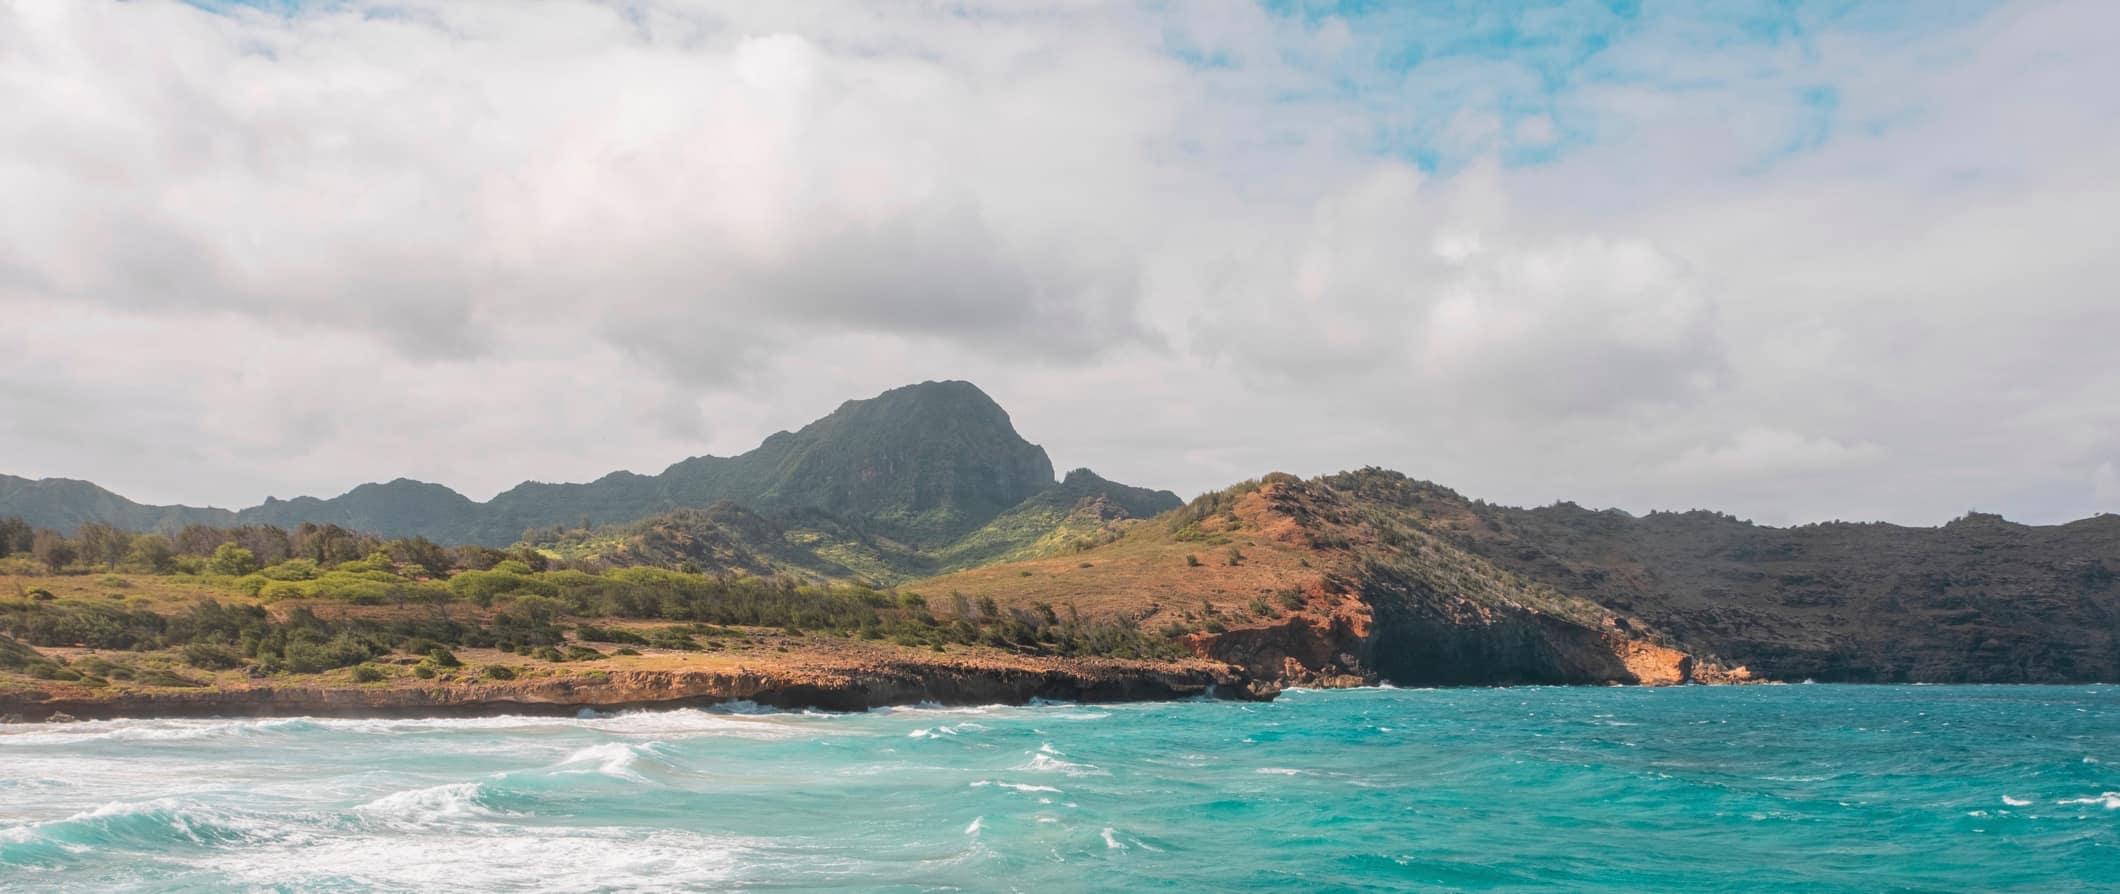 A stunning beach in Hawaii